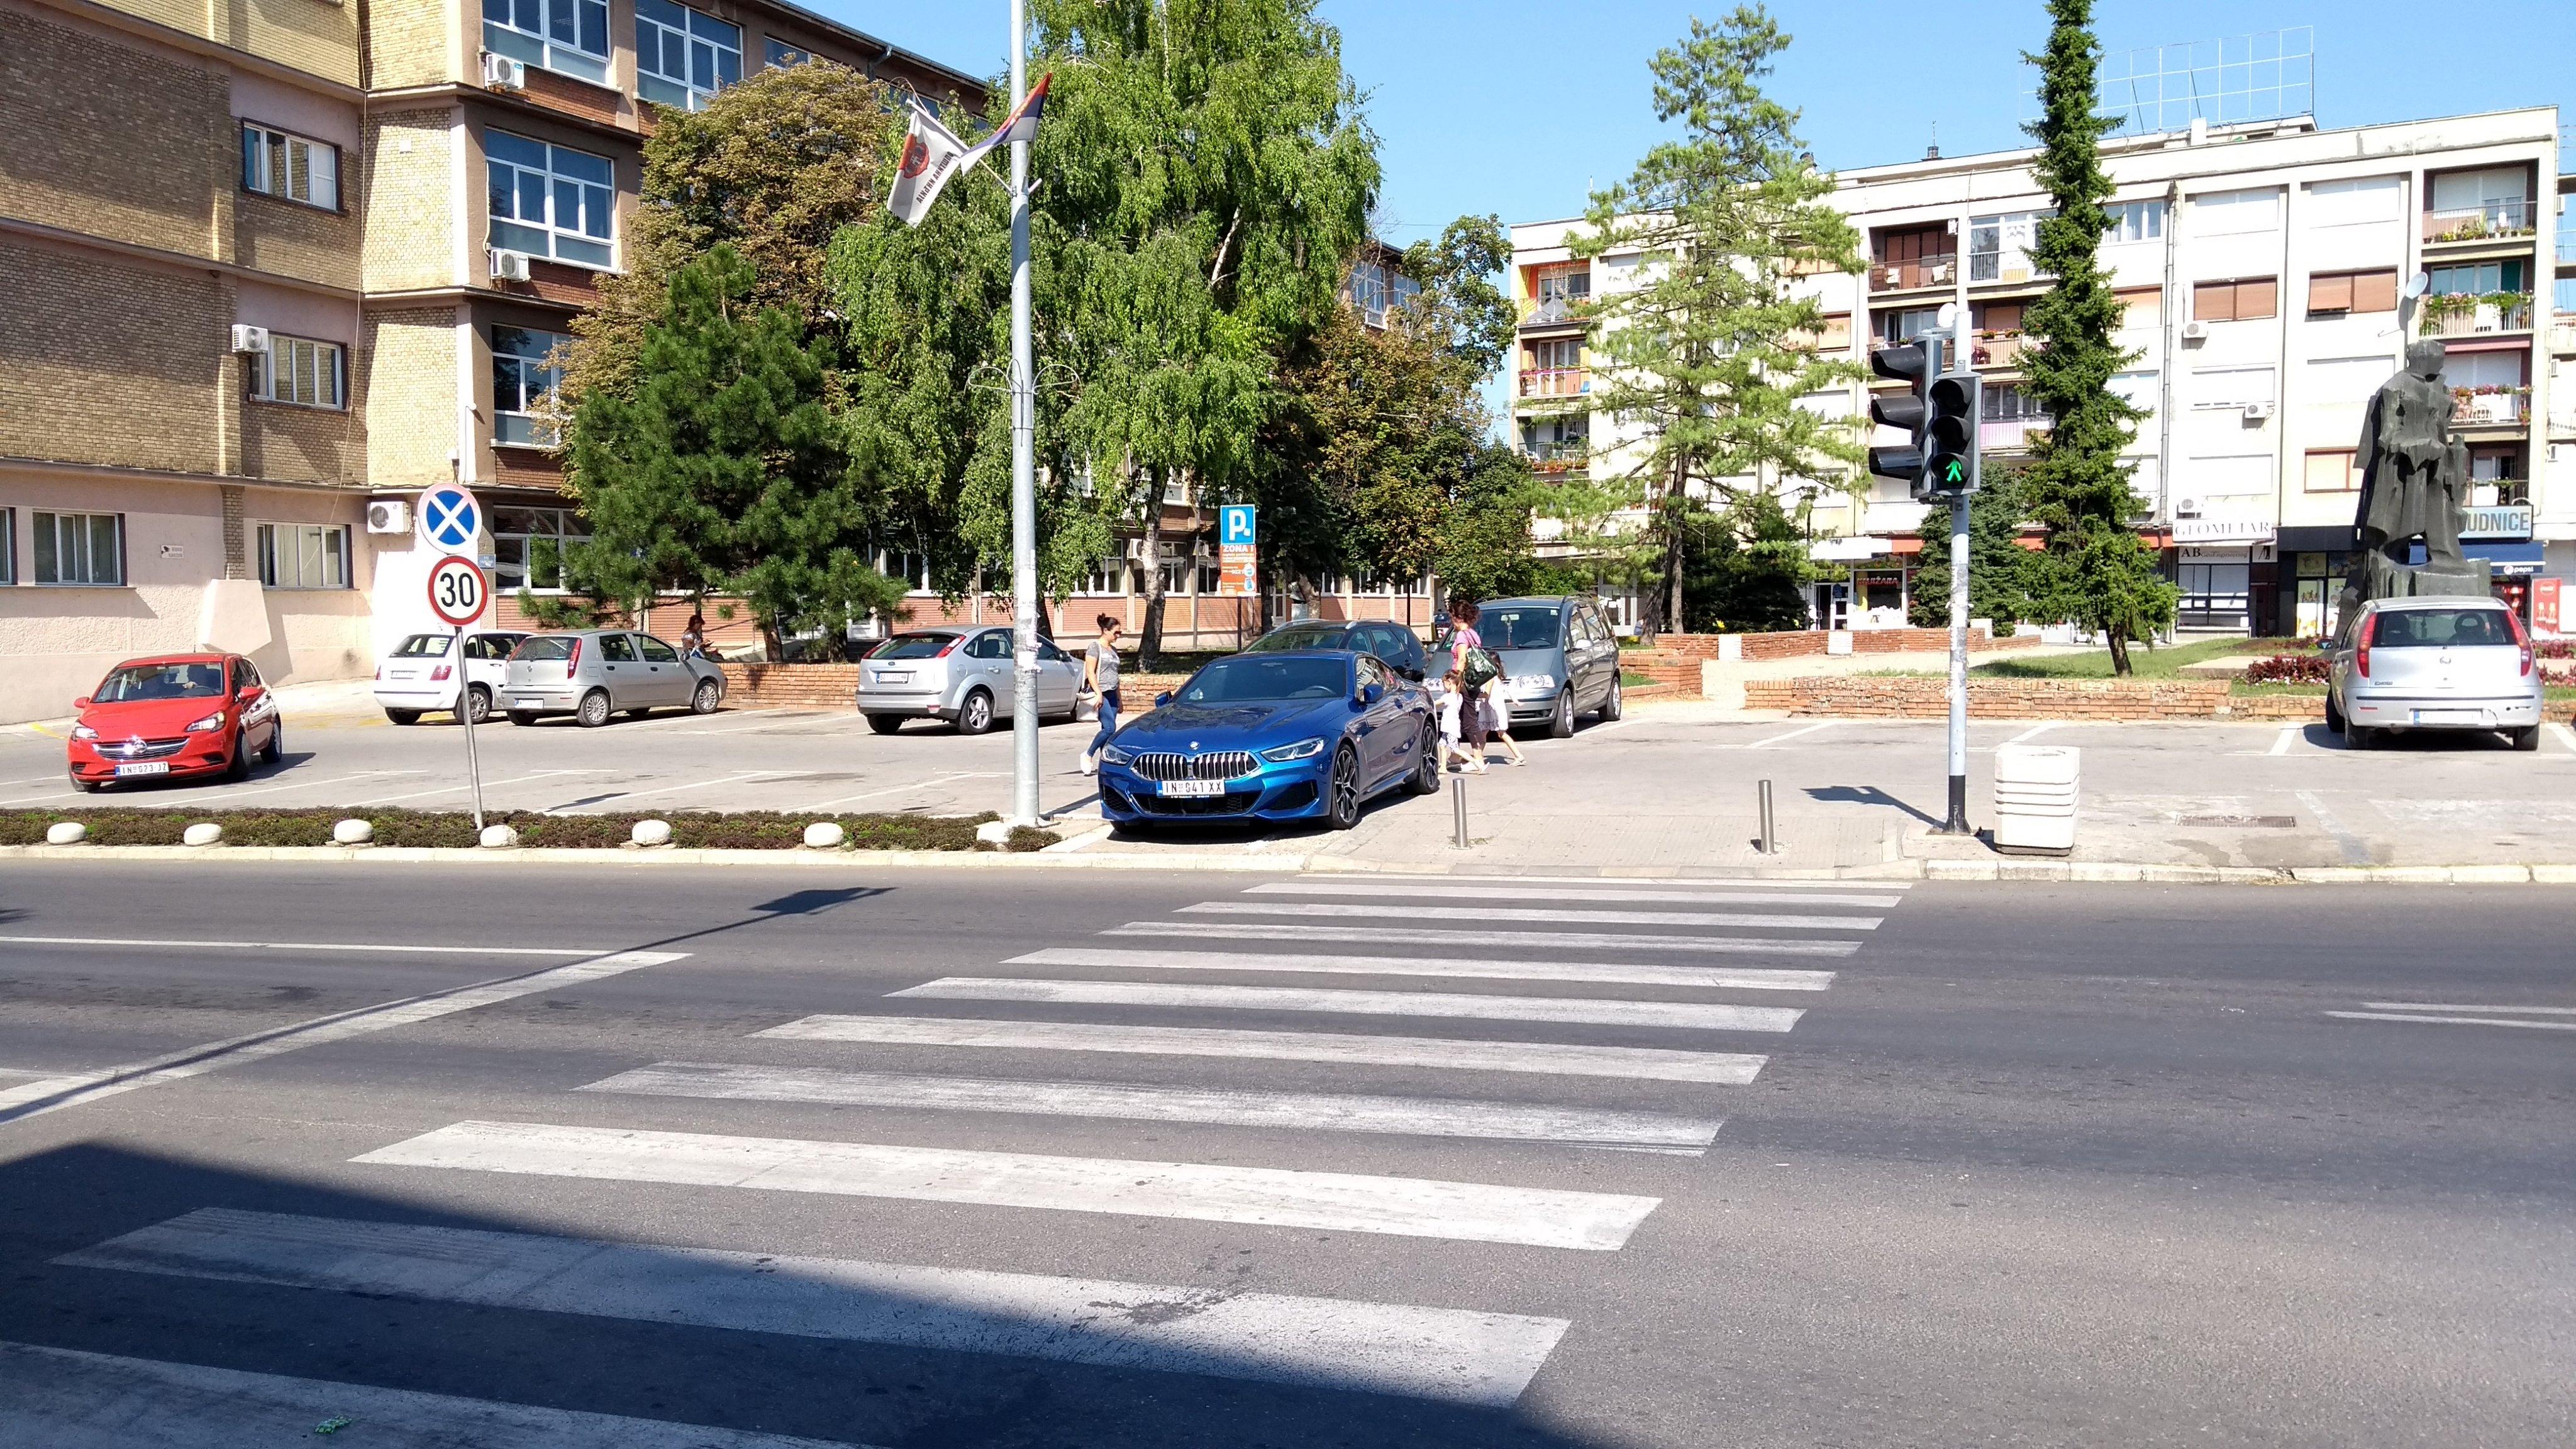 2019 - [BMW] Série 8 (G14/G15) - Page 26 EB1uSpsXsAA1PdO?format=jpg&name=orig